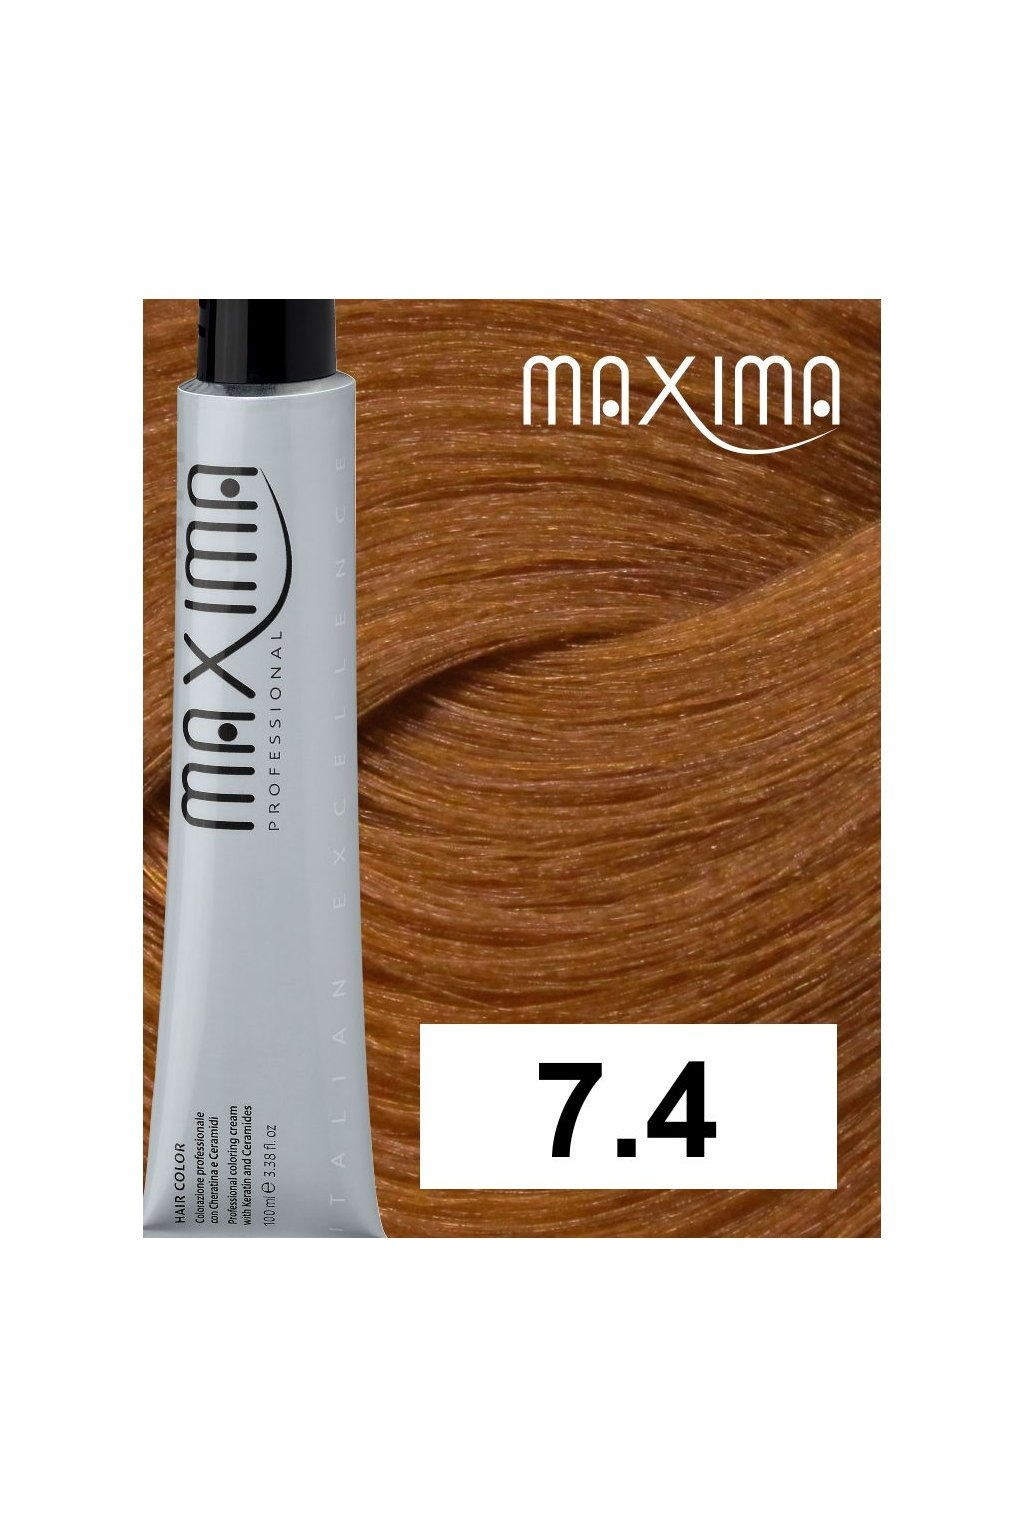 7 4 max